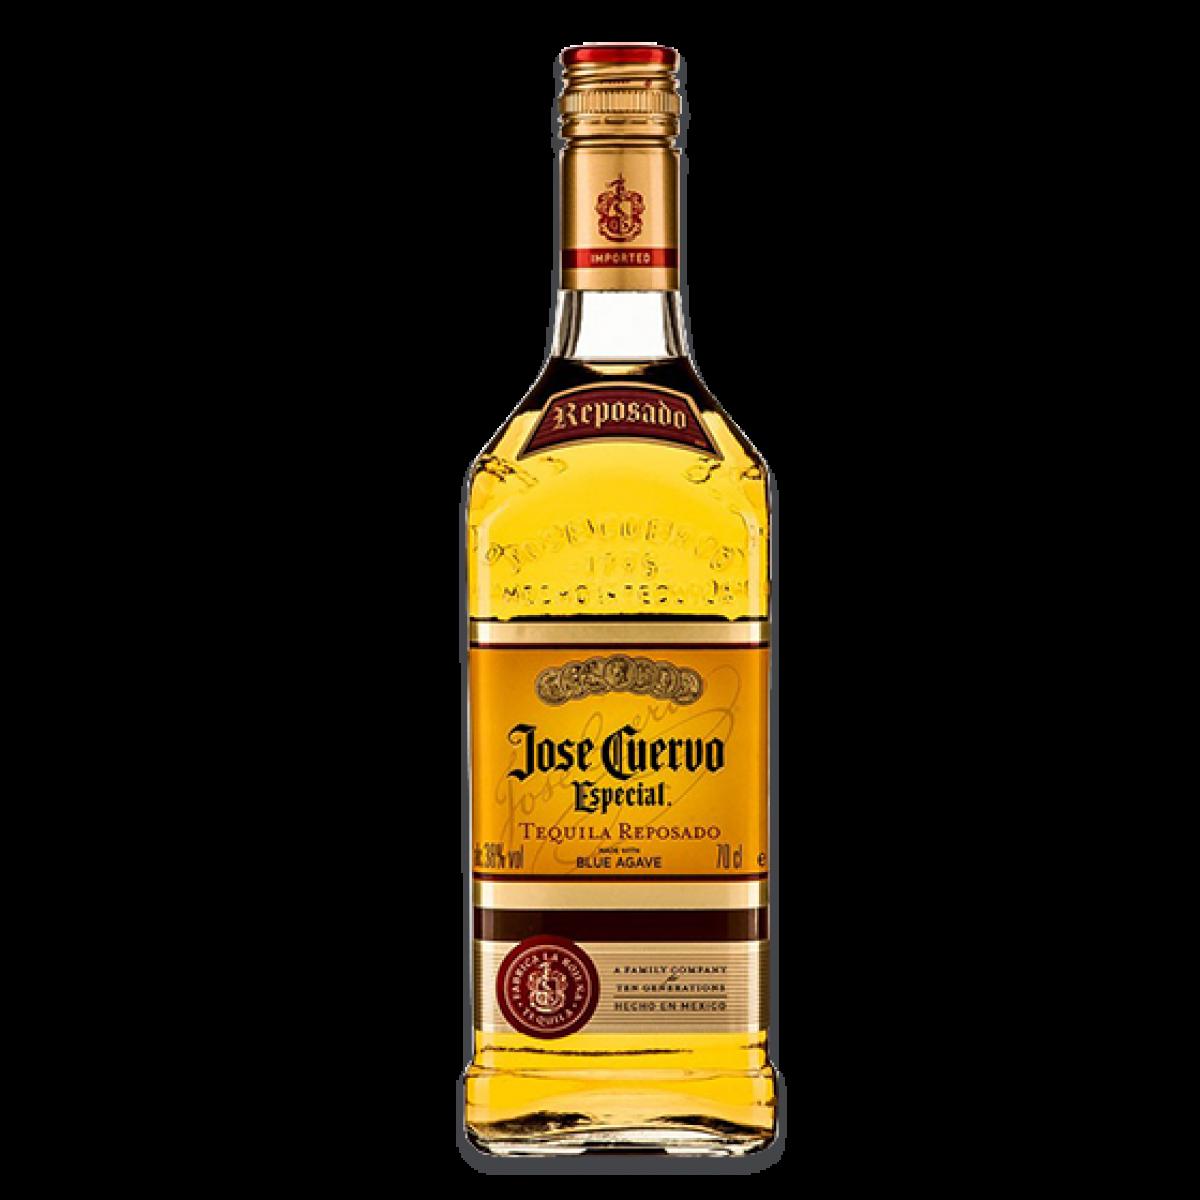 Tequila bottle png. Jose cuervo gold ml